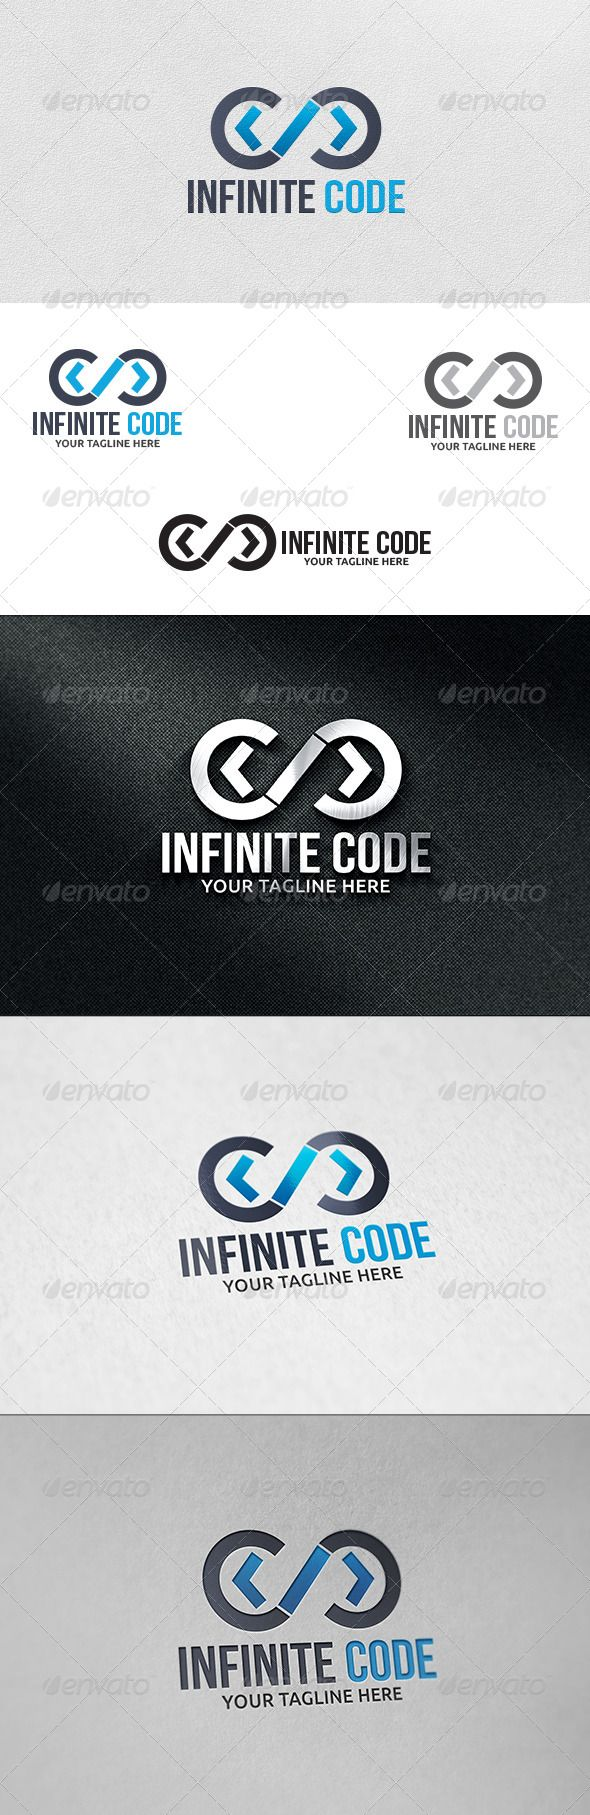 Infinite Code  - Logo Design Template Vector #logotype Download it here: http://graphicriver.net/item/infinite-code-logo-template/6159540?s_rank=520?ref=nesto